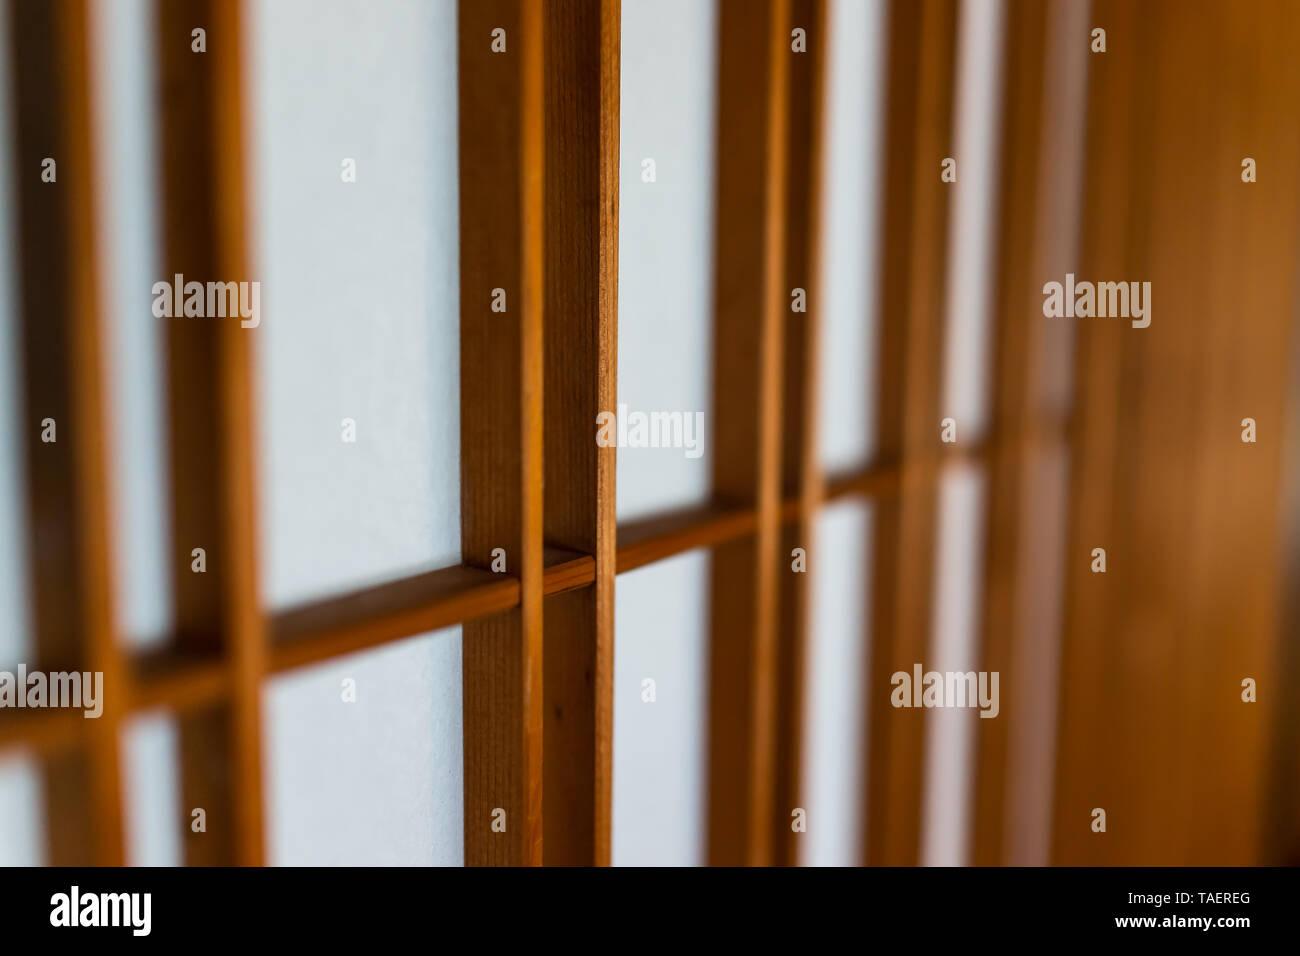 Japanese Screen Doors Stock Photos U0026 Japanese Screen Doors ...